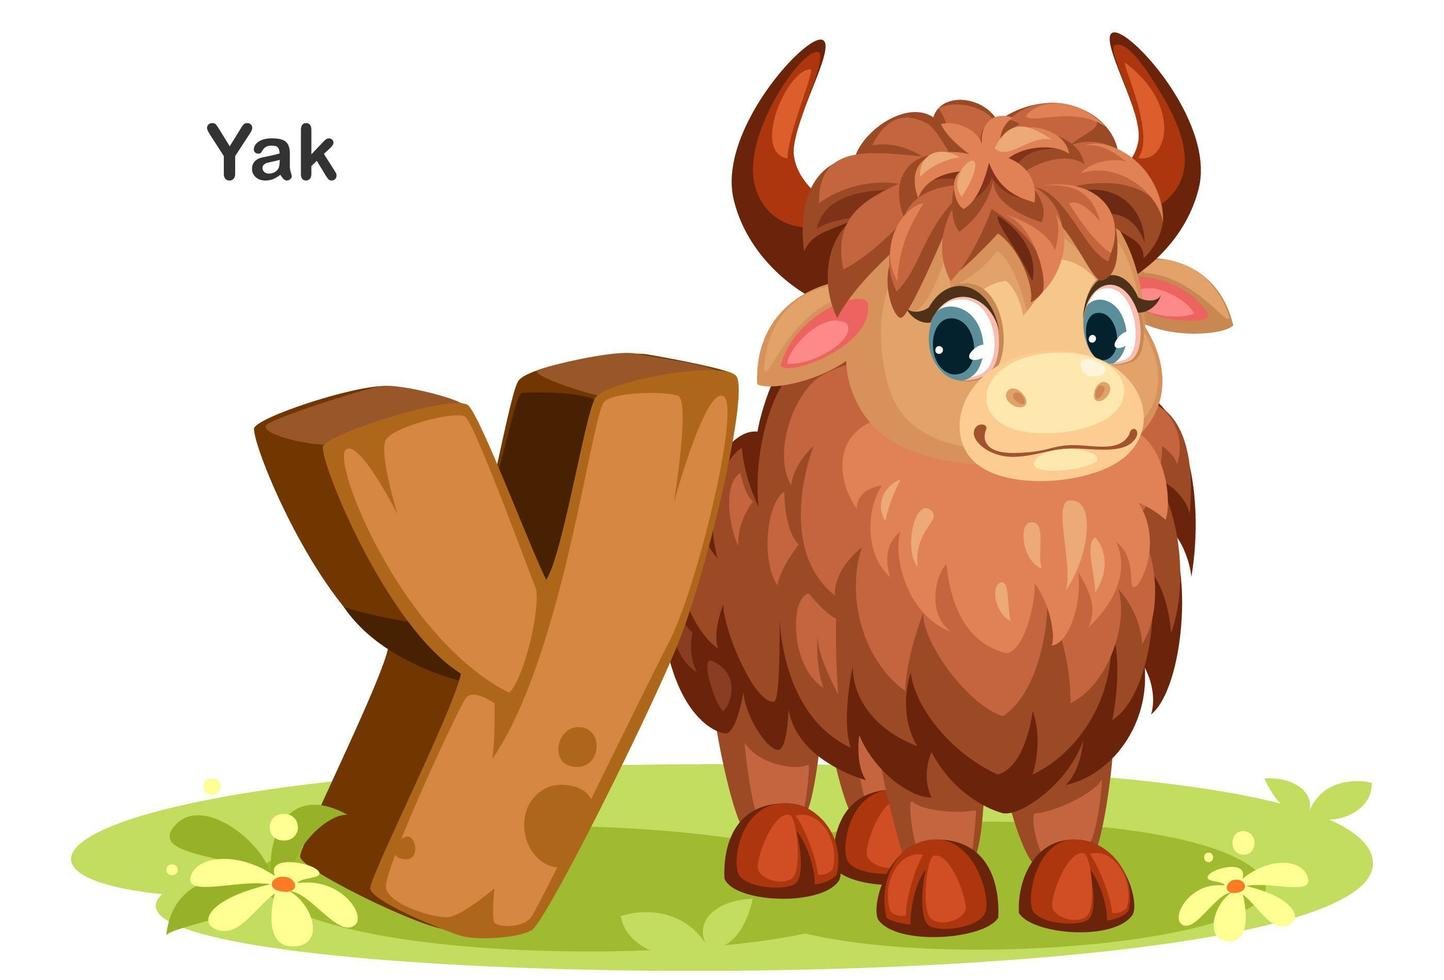 y für yak vektor